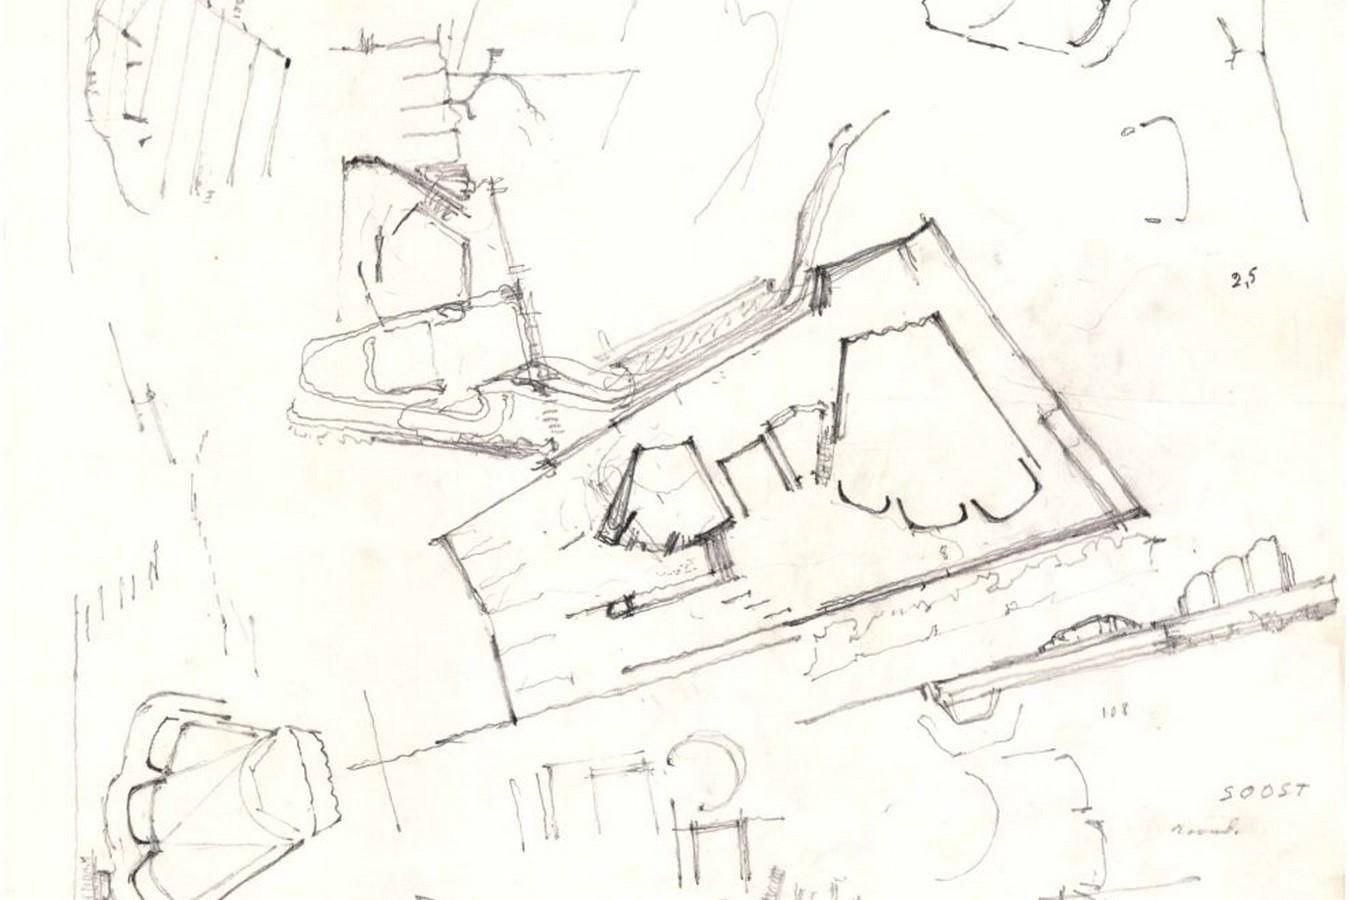 Finlandia Hall by Alvar Aalto: Celebrating Light and Nature - Sheet2